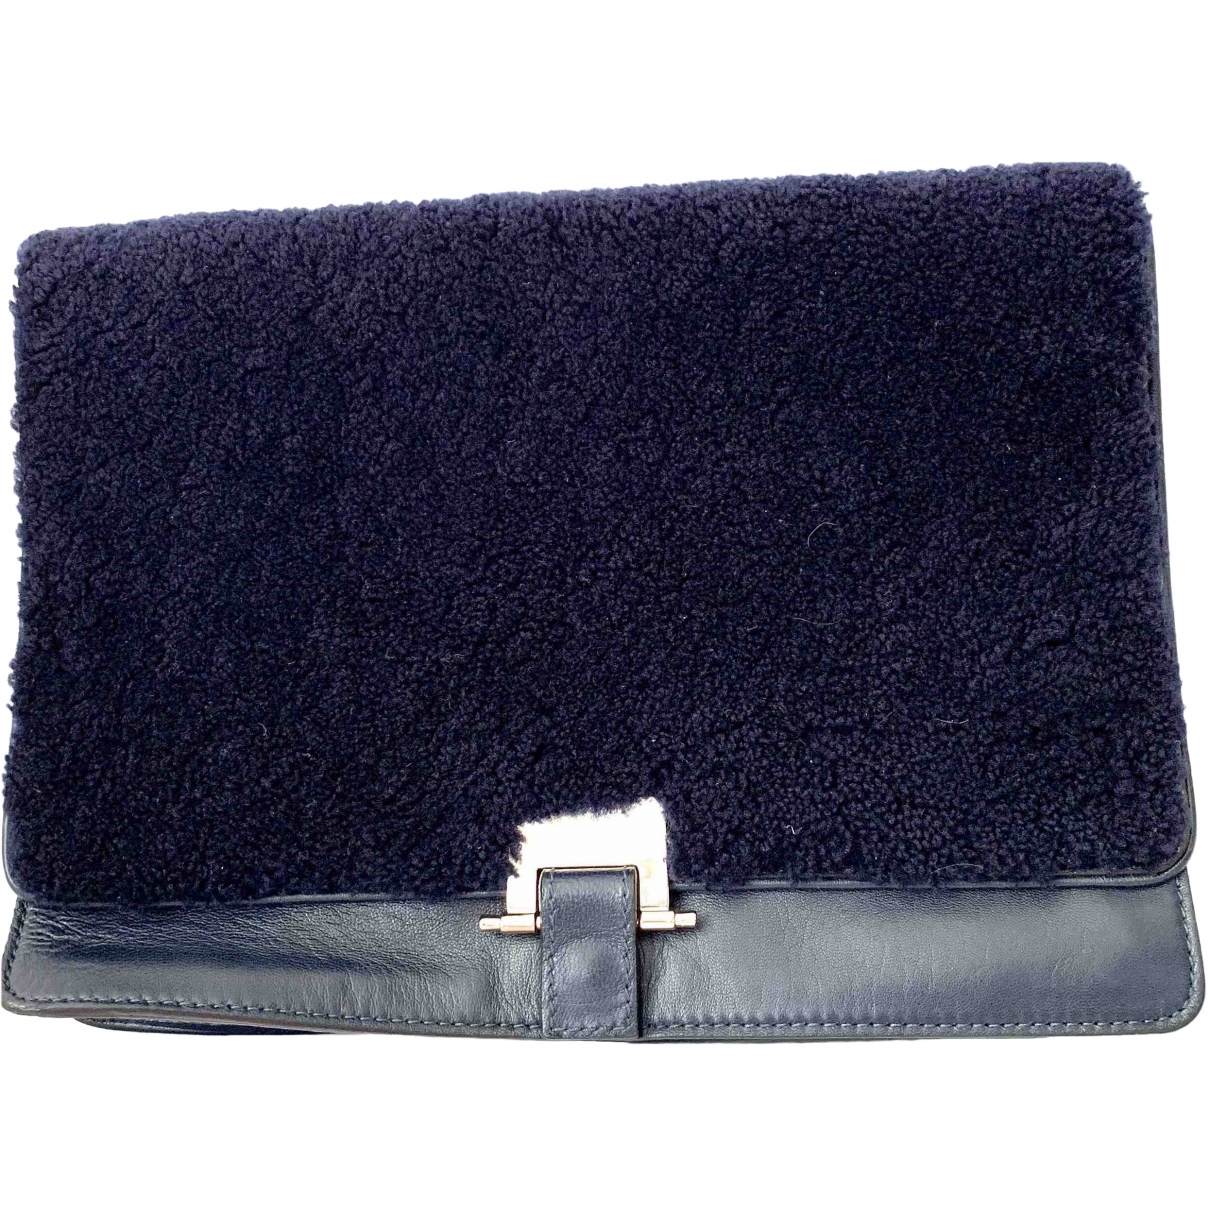 Sandro \N Blue Leather Clutch bag for Women \N